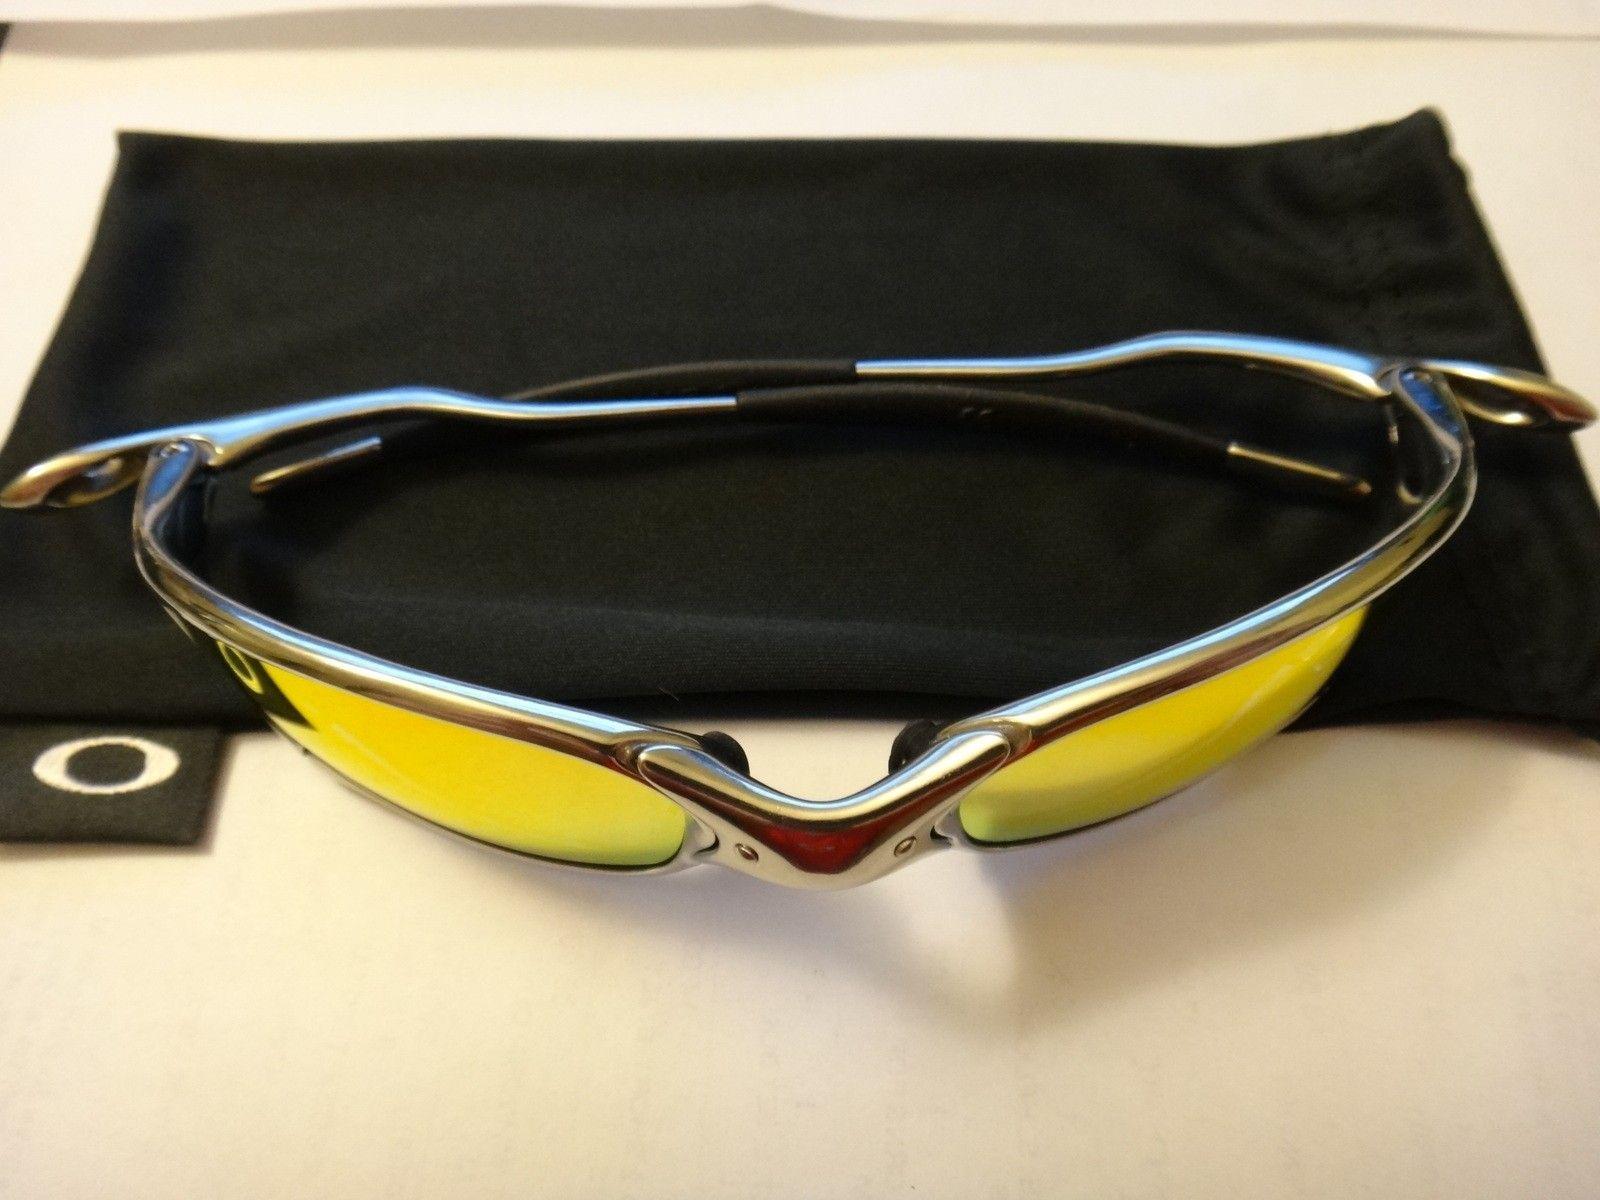 Polished juliet w/ fire iridium polarized lens $365 contUS - DSC07485.JPG